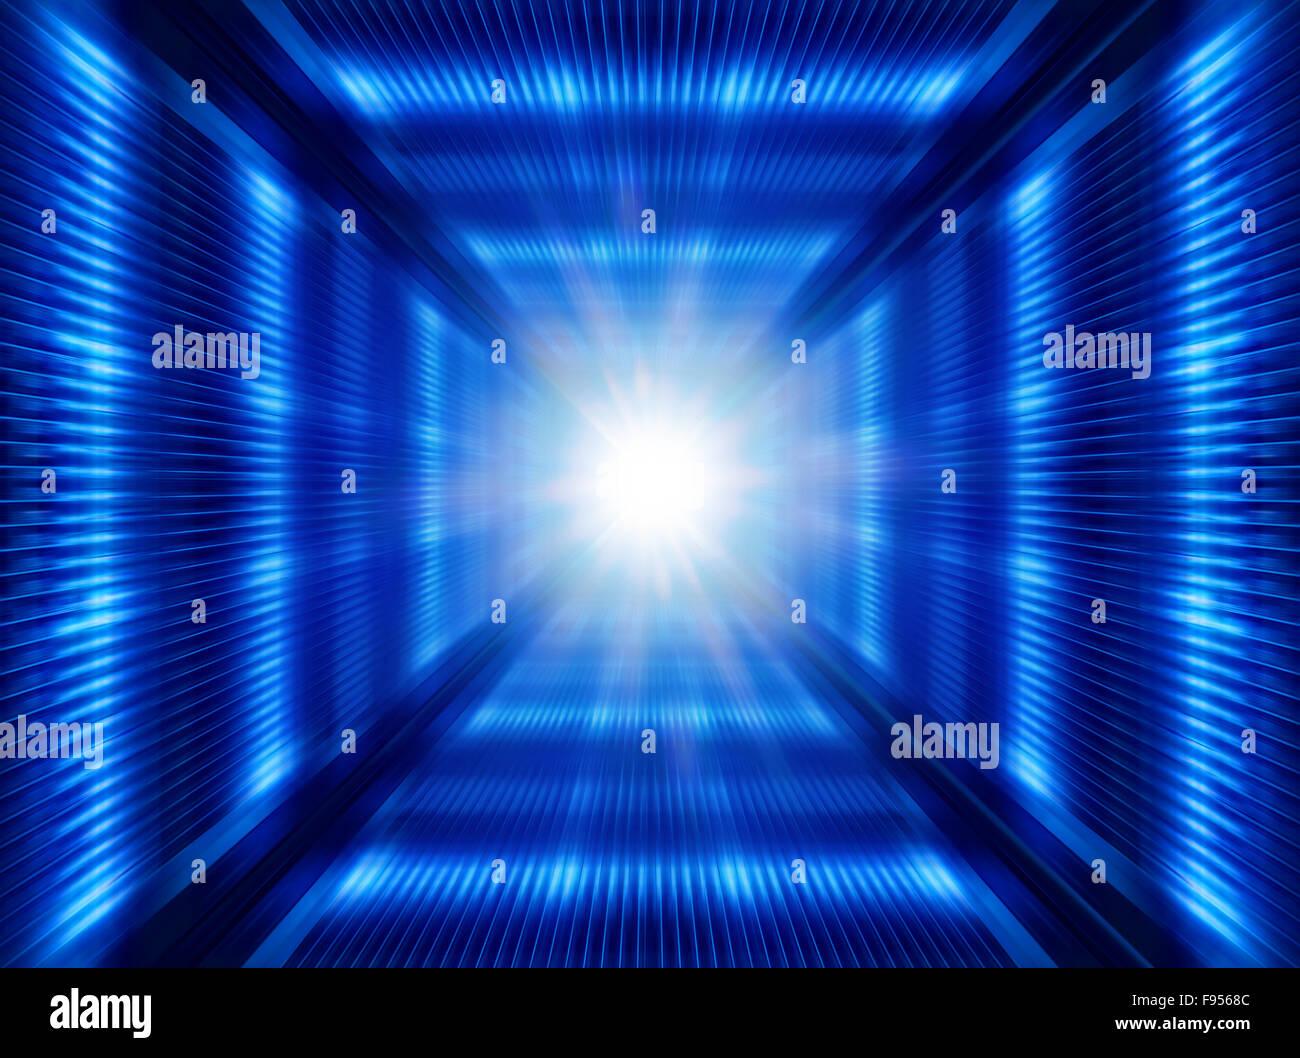 Multi-couleur lumineux graissé abstract background, illustration futuriste Photo Stock